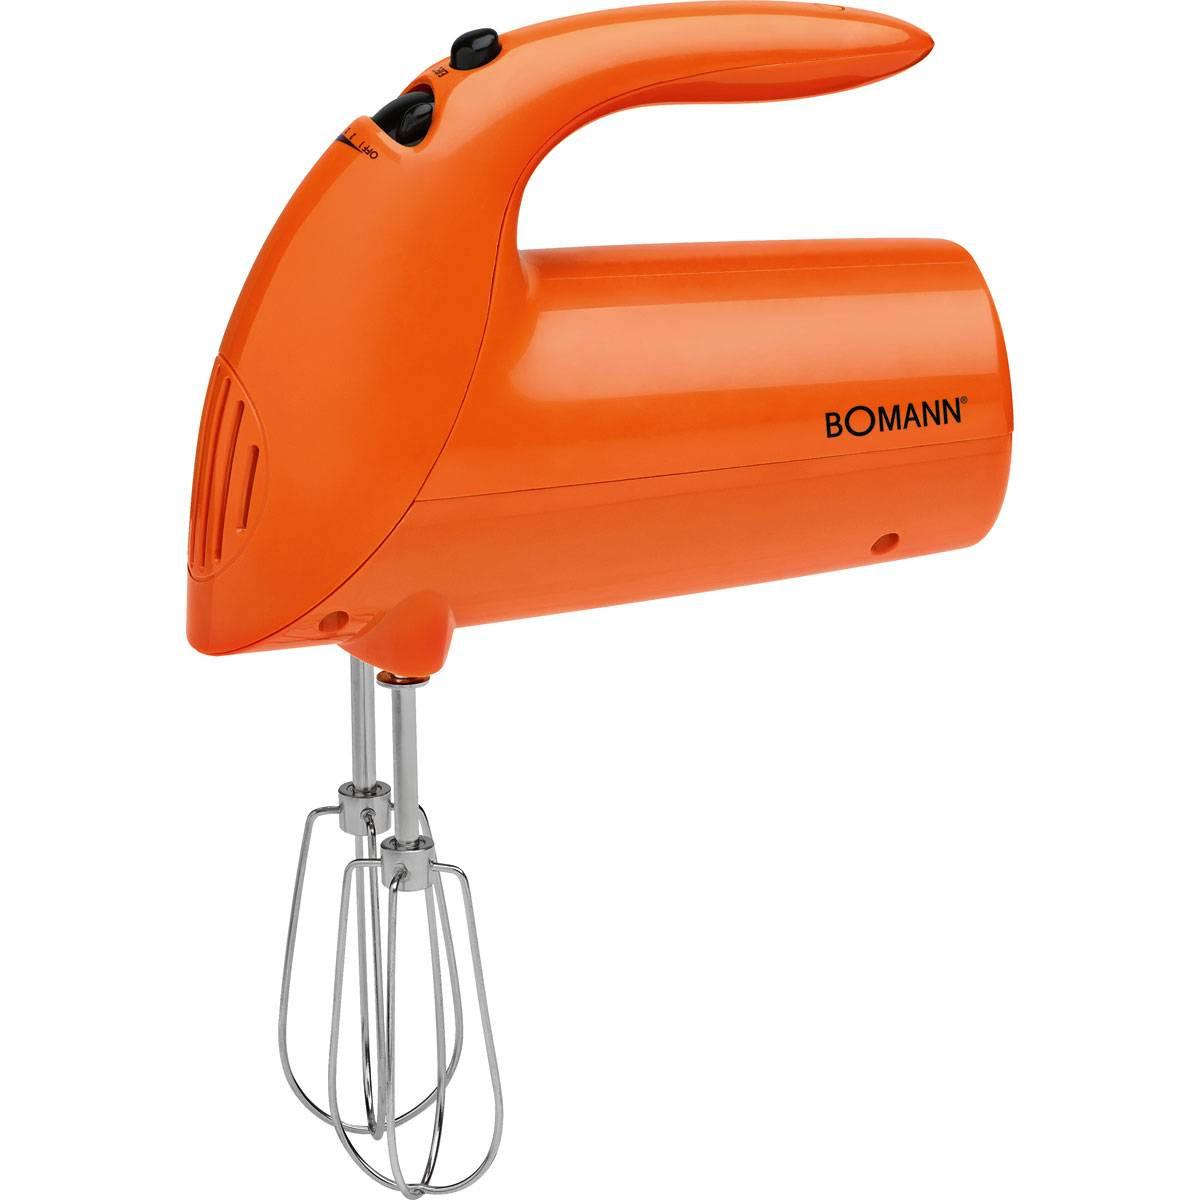 Bomann Batidora de Mano HM 350 Naranja